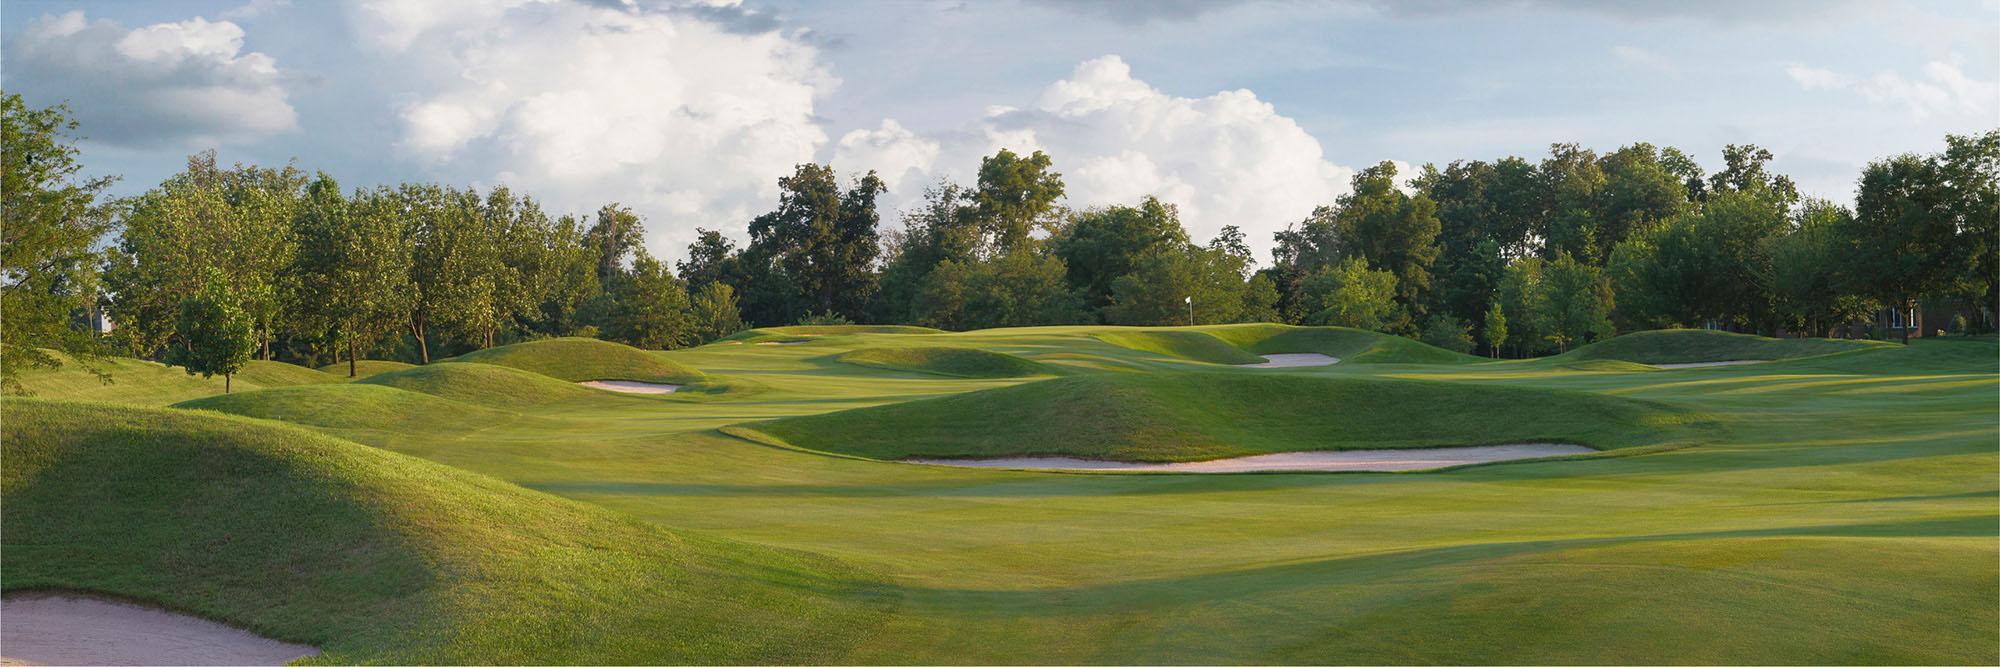 Golf Course Image - Heritage Club No. 16